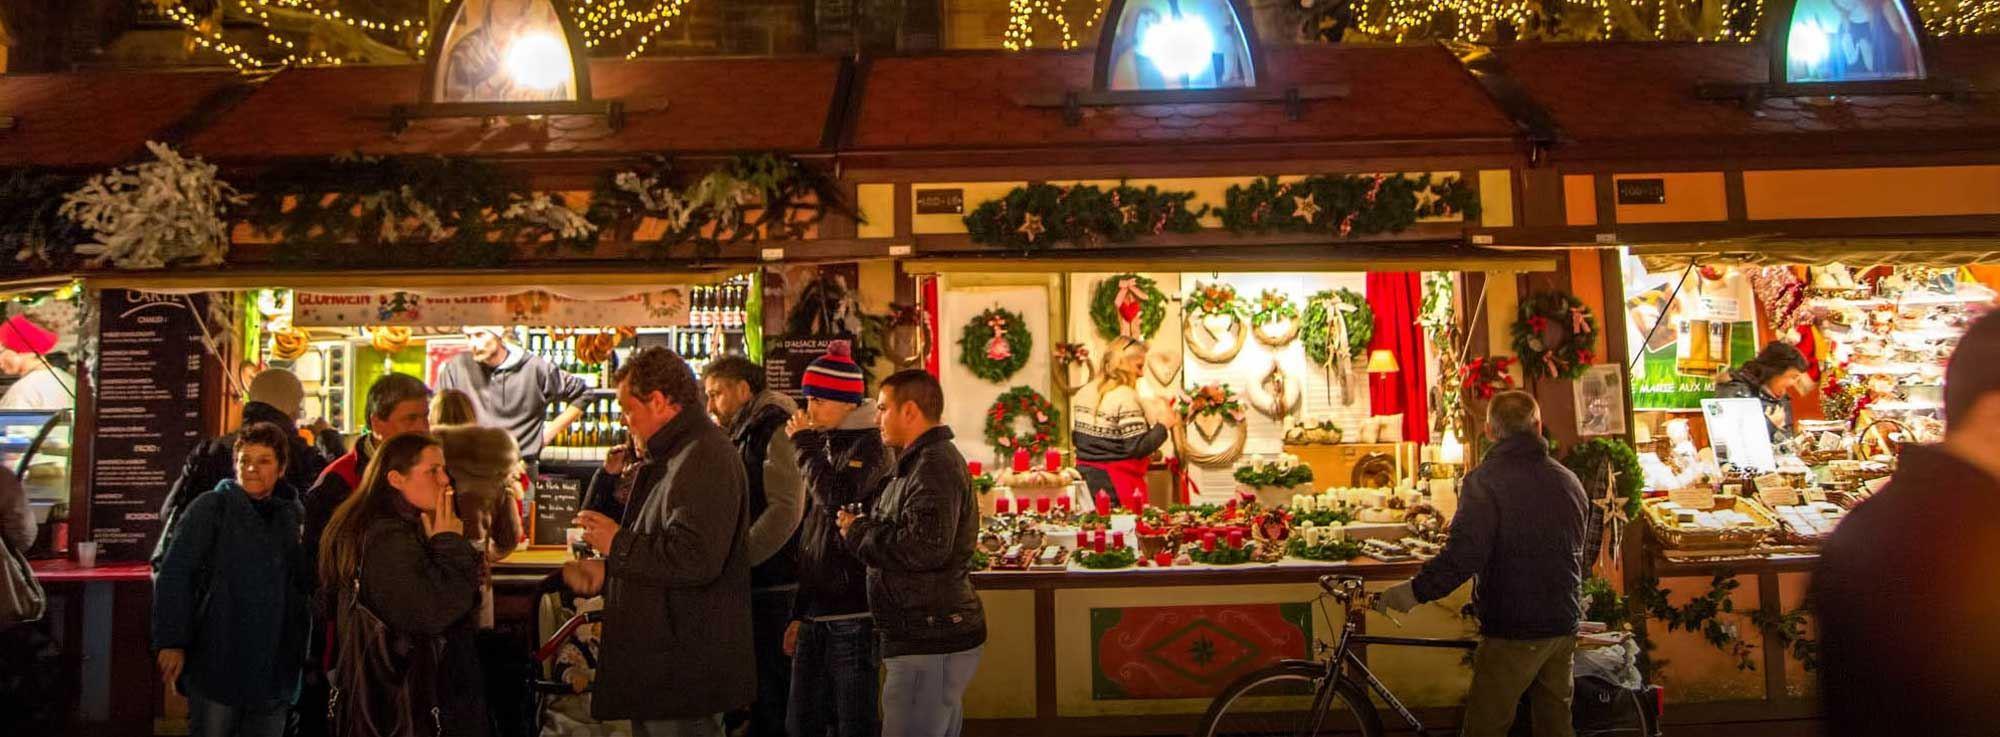 Cerignola: Mercatini di Natale